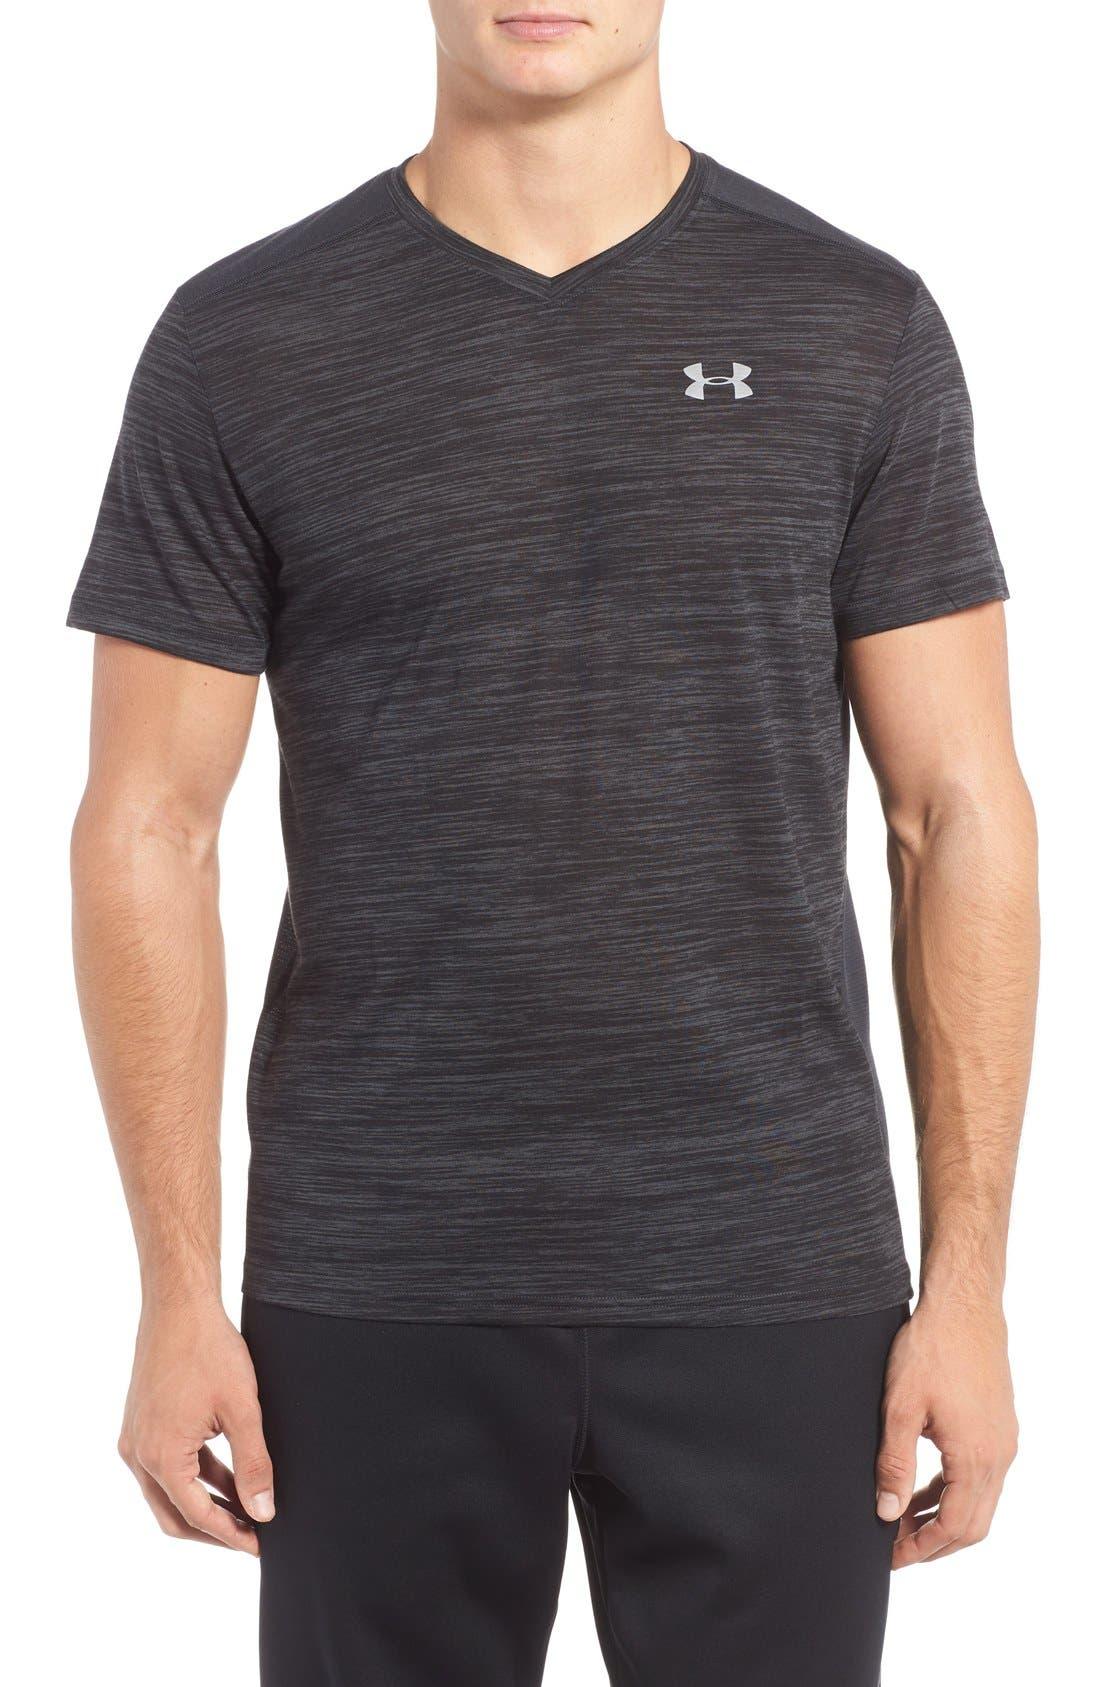 Main Image - Under Armour 'Streaker Run' Microthread V-Neck T-Shirt